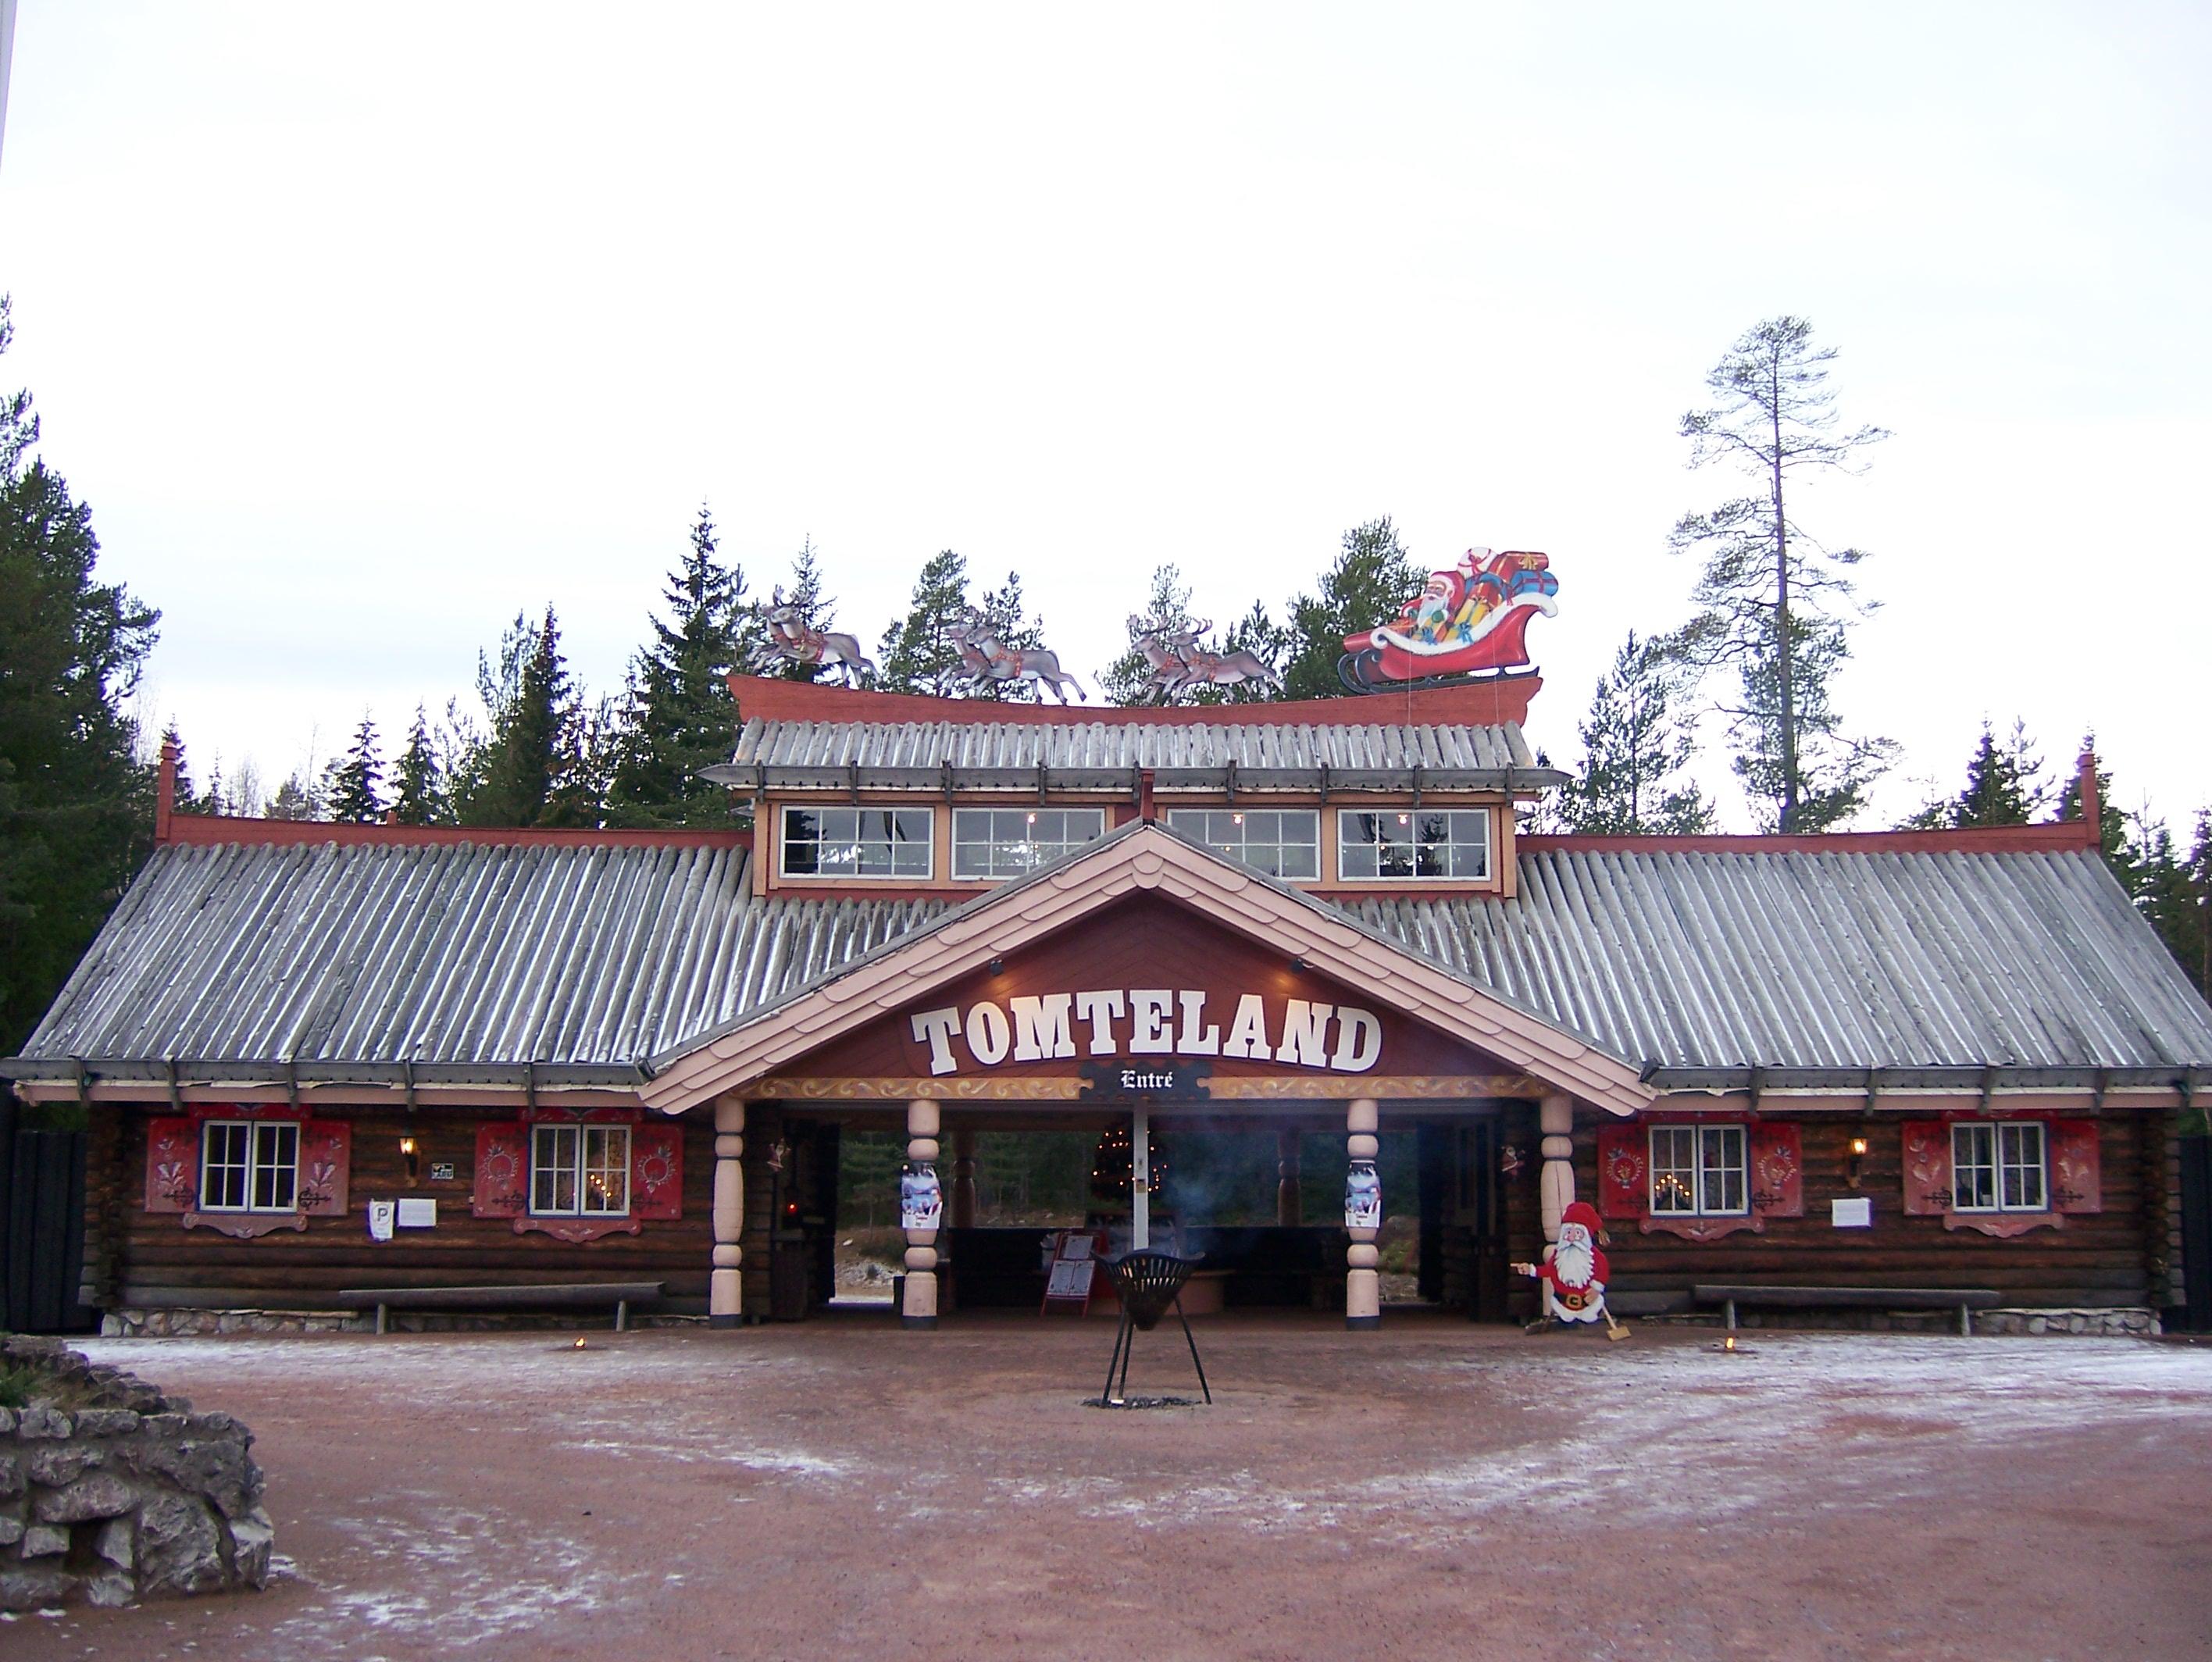 Tomteland entrance